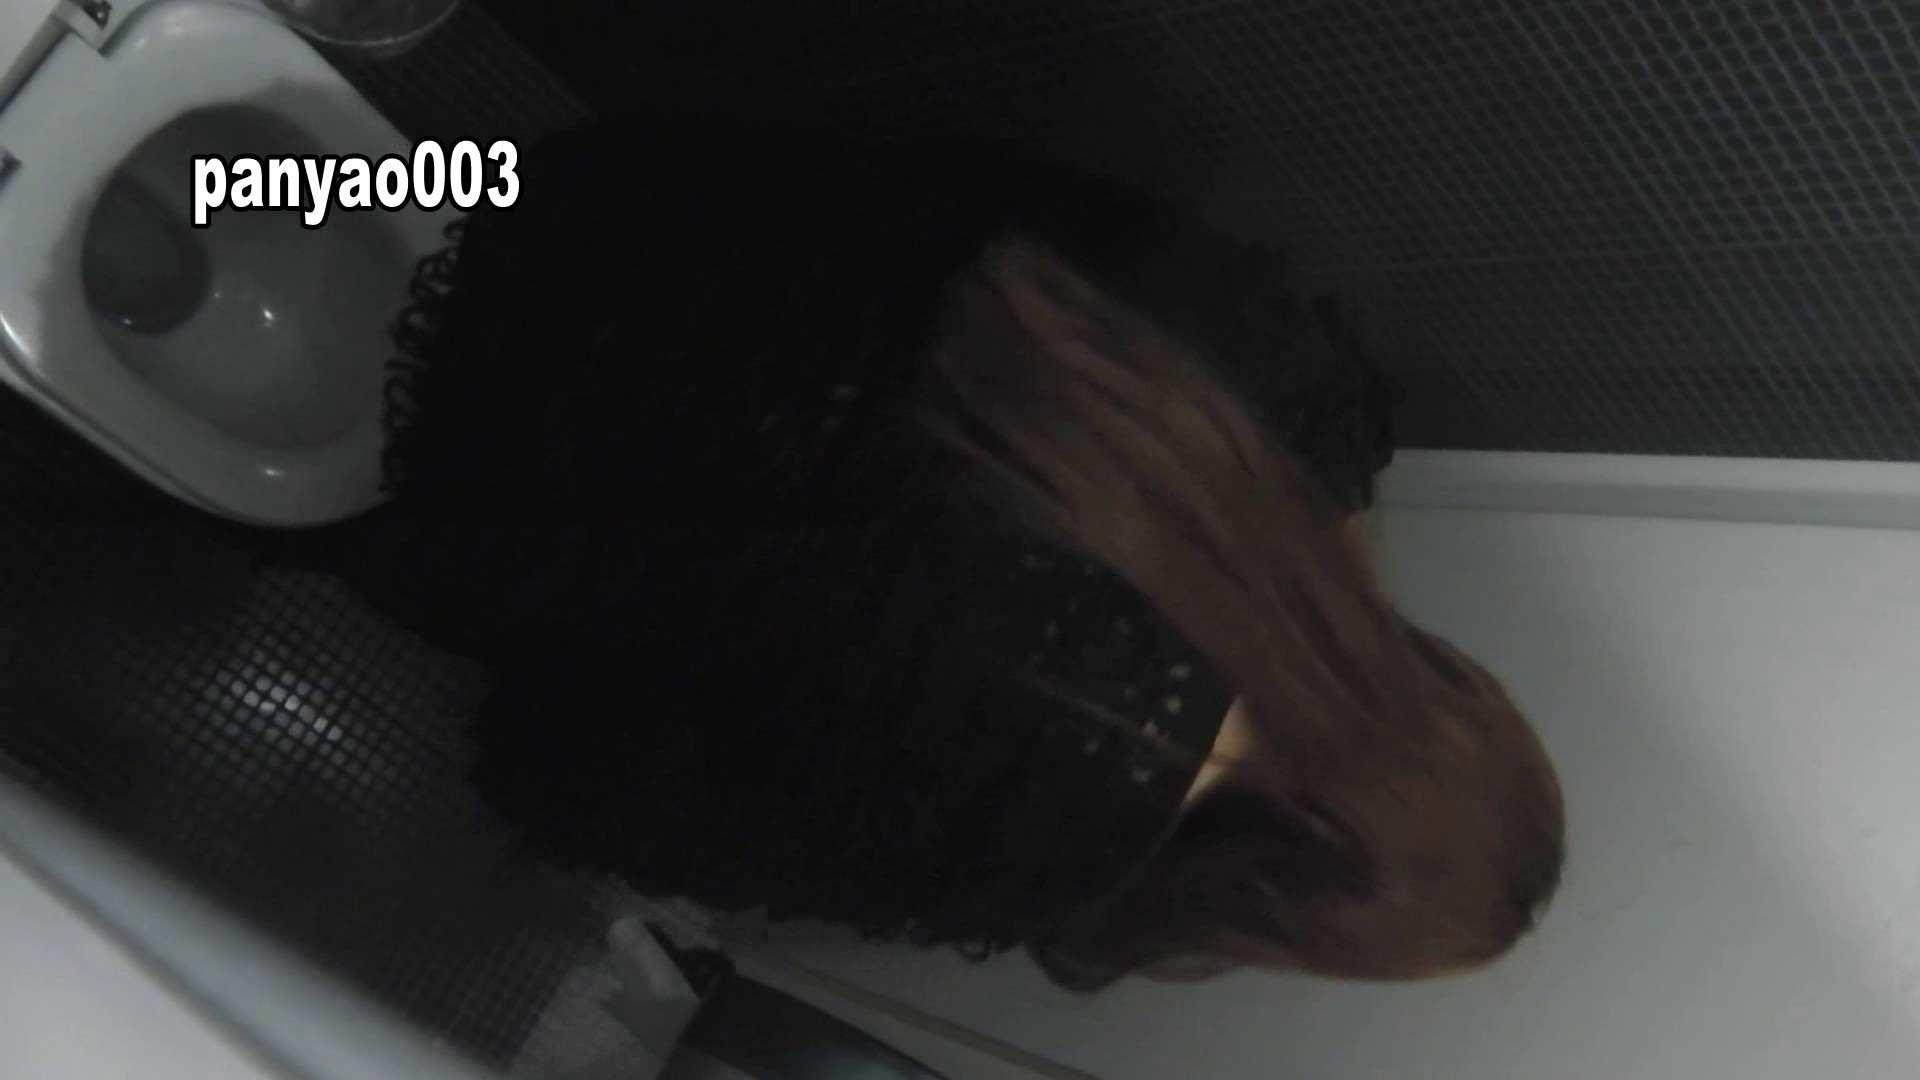 vol.03 ミリミリミリィ 隠れた名作 AV動画キャプチャ 87画像 5